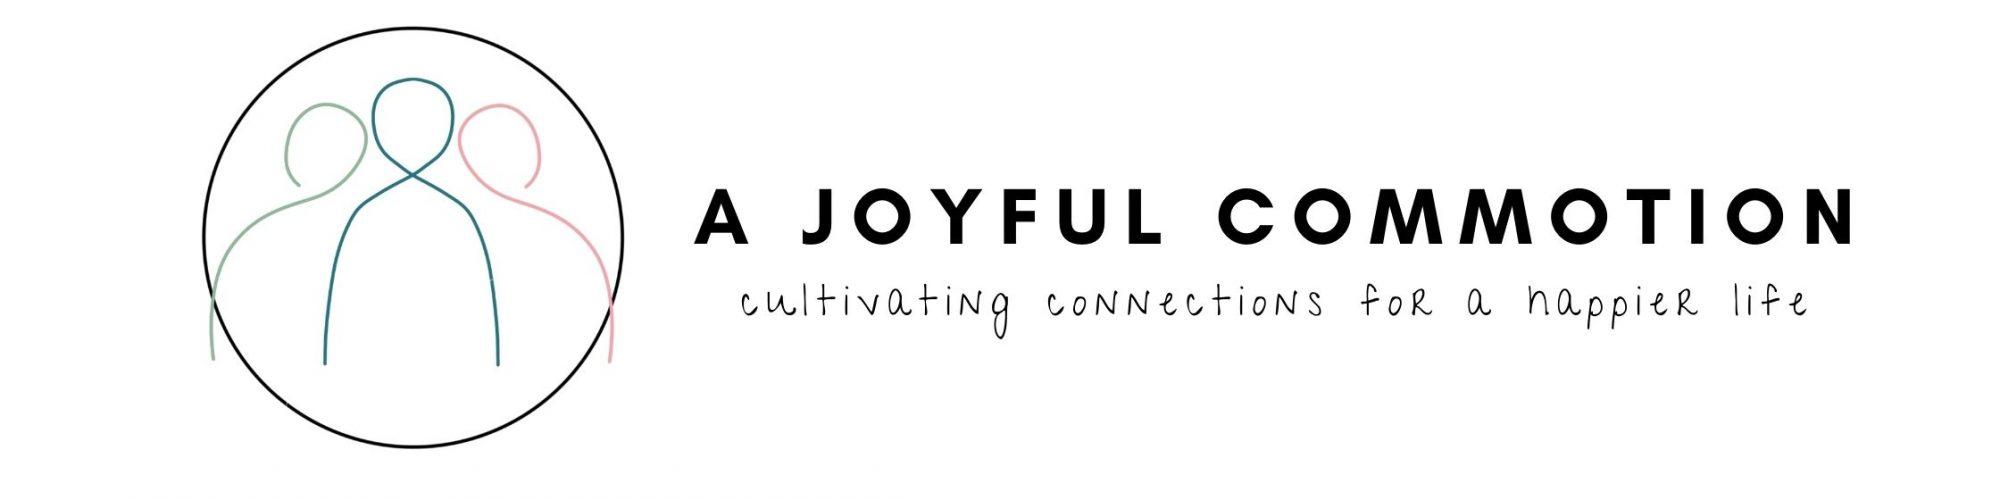 A Joyful Commotion